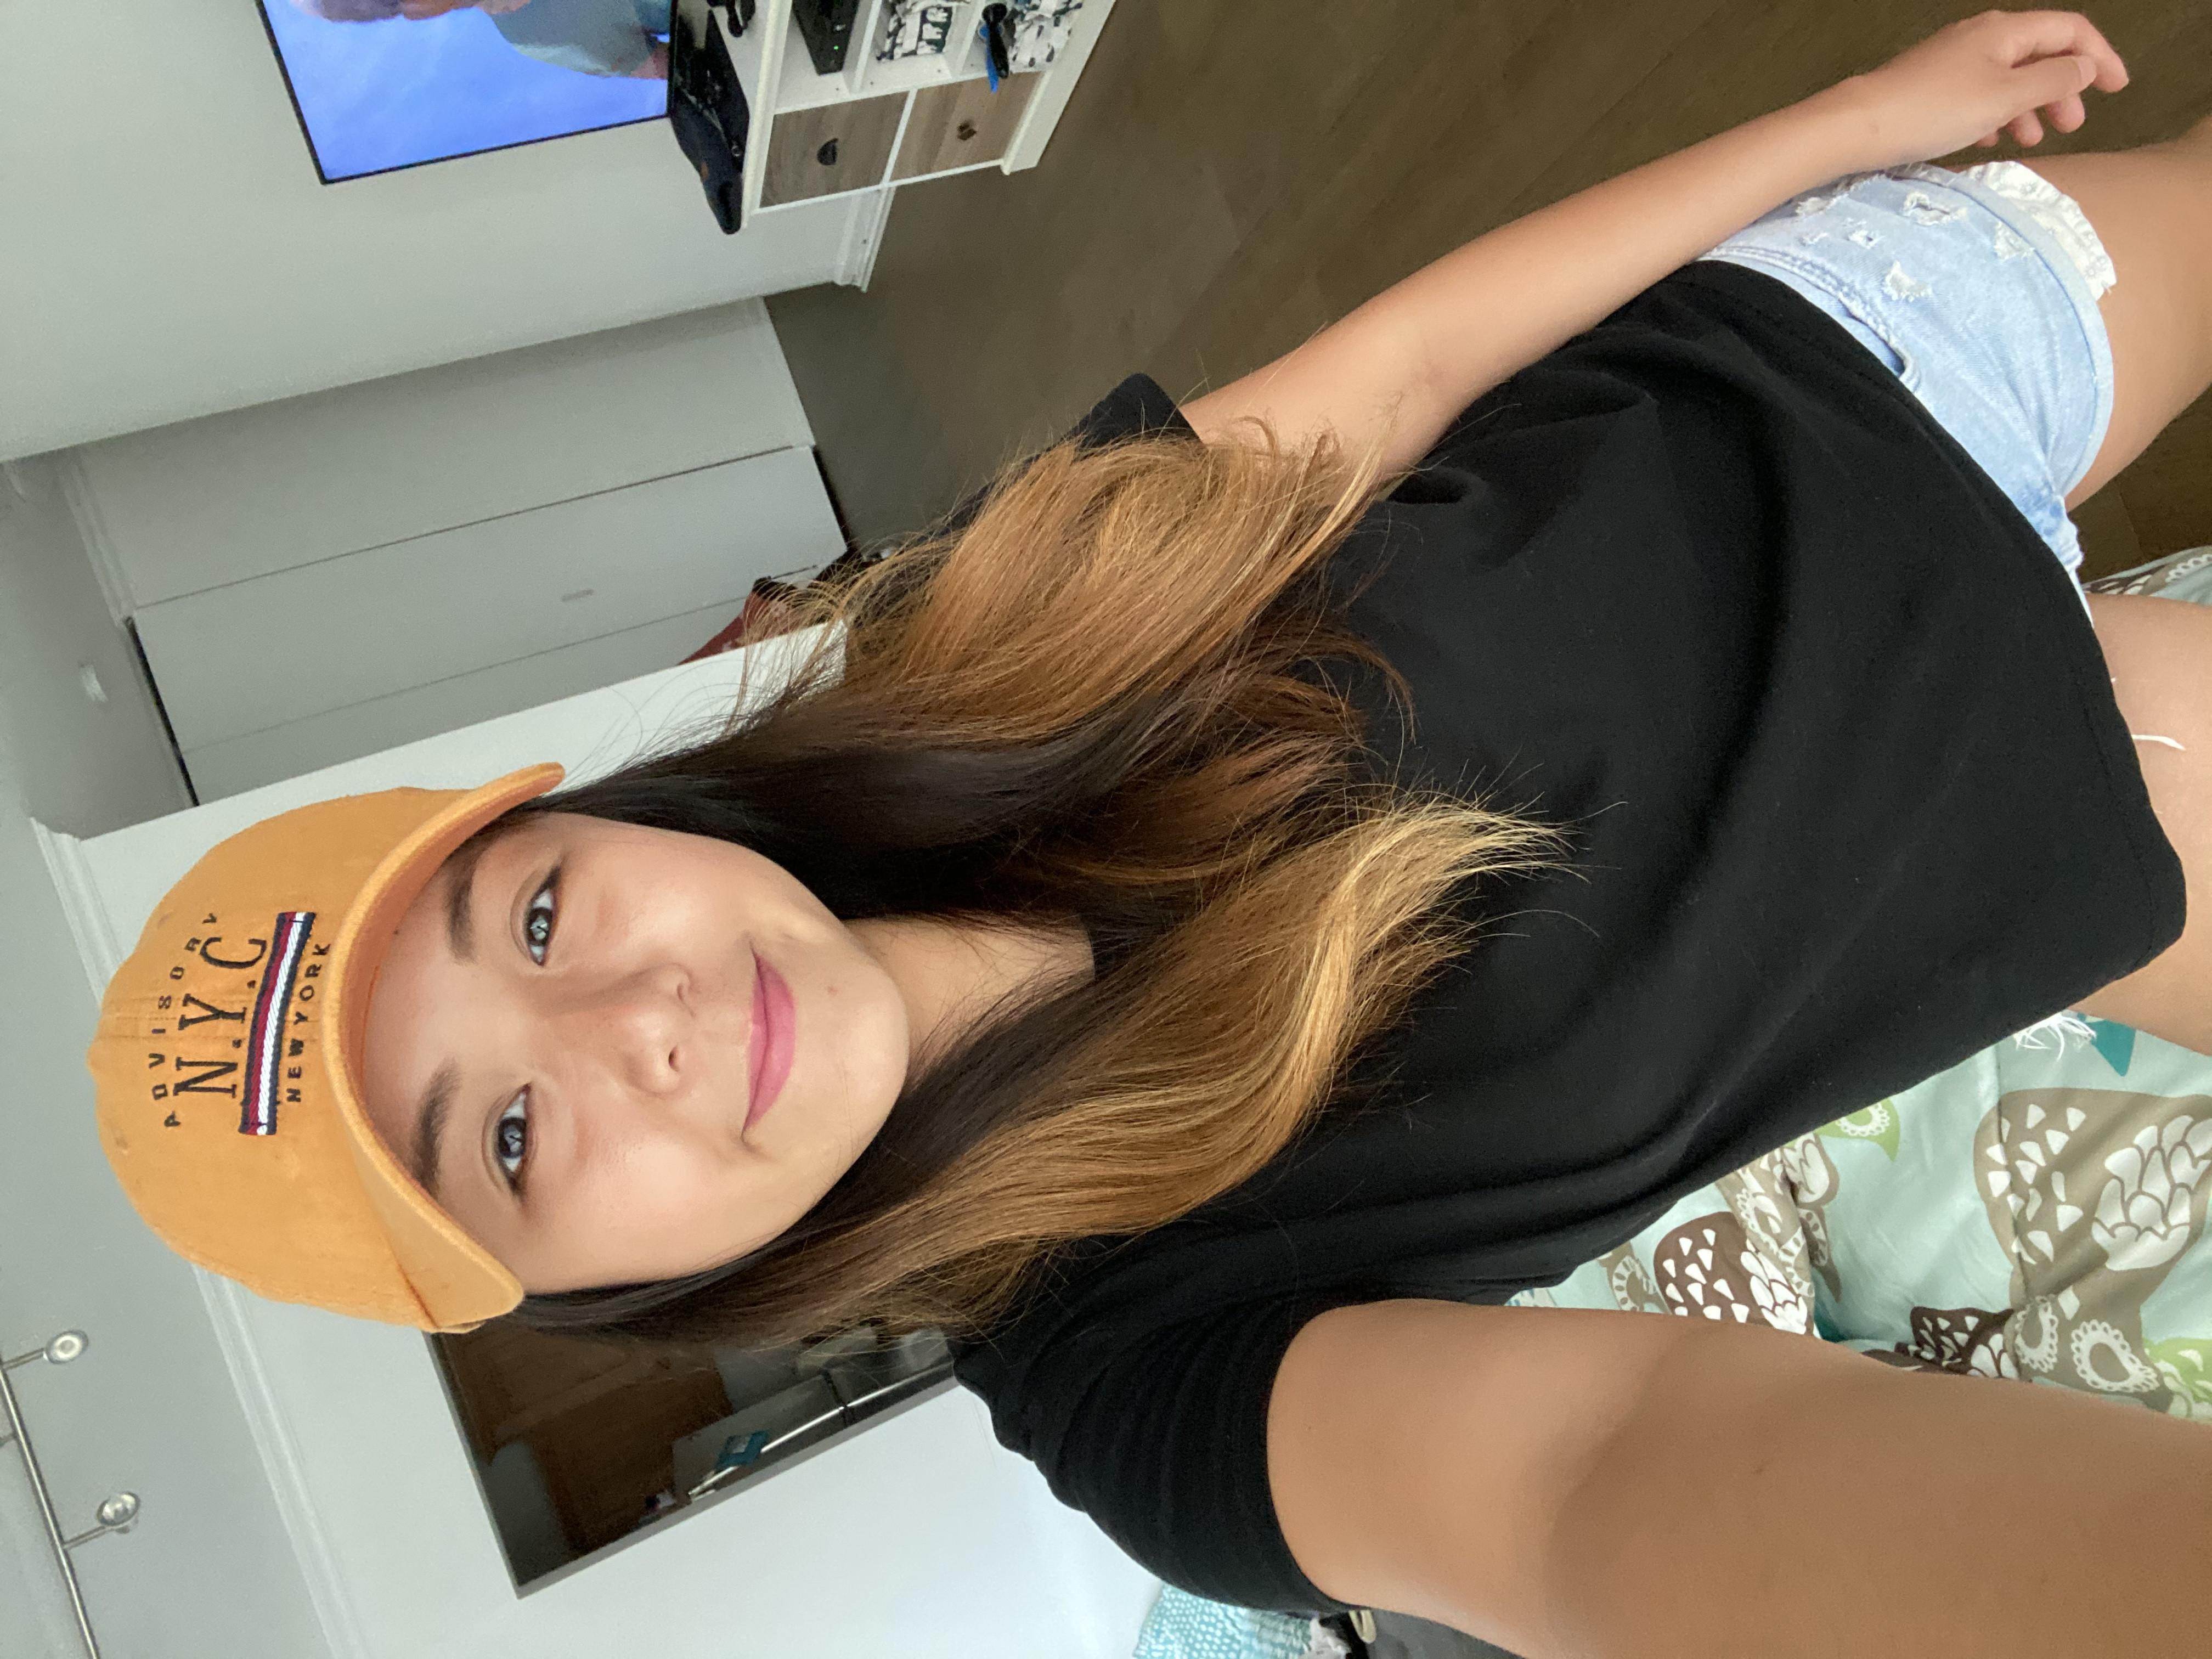 Janice's User Image